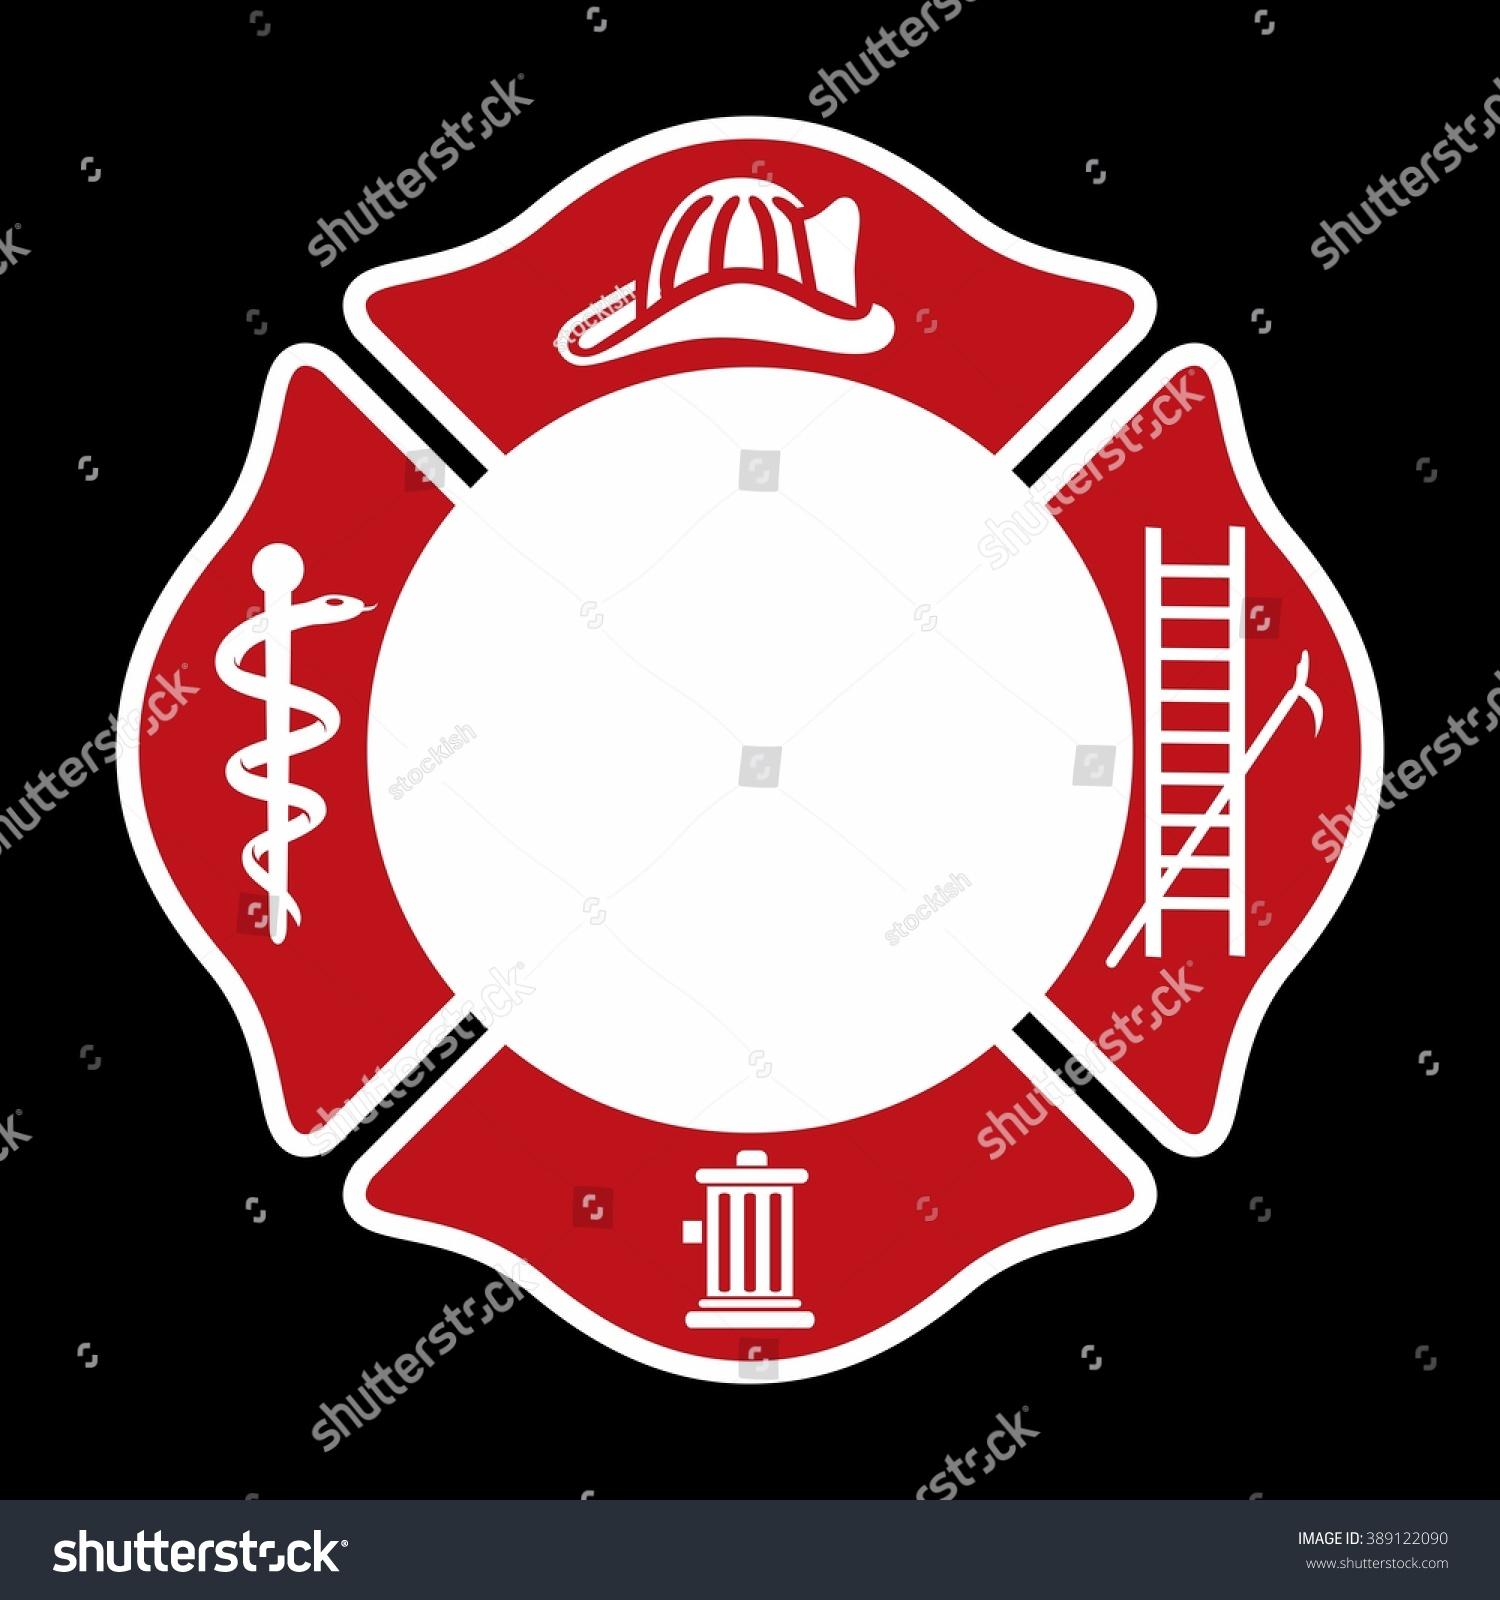 fireman emblem fire department symbol logo stock vector 389122090 shutterstock. Black Bedroom Furniture Sets. Home Design Ideas